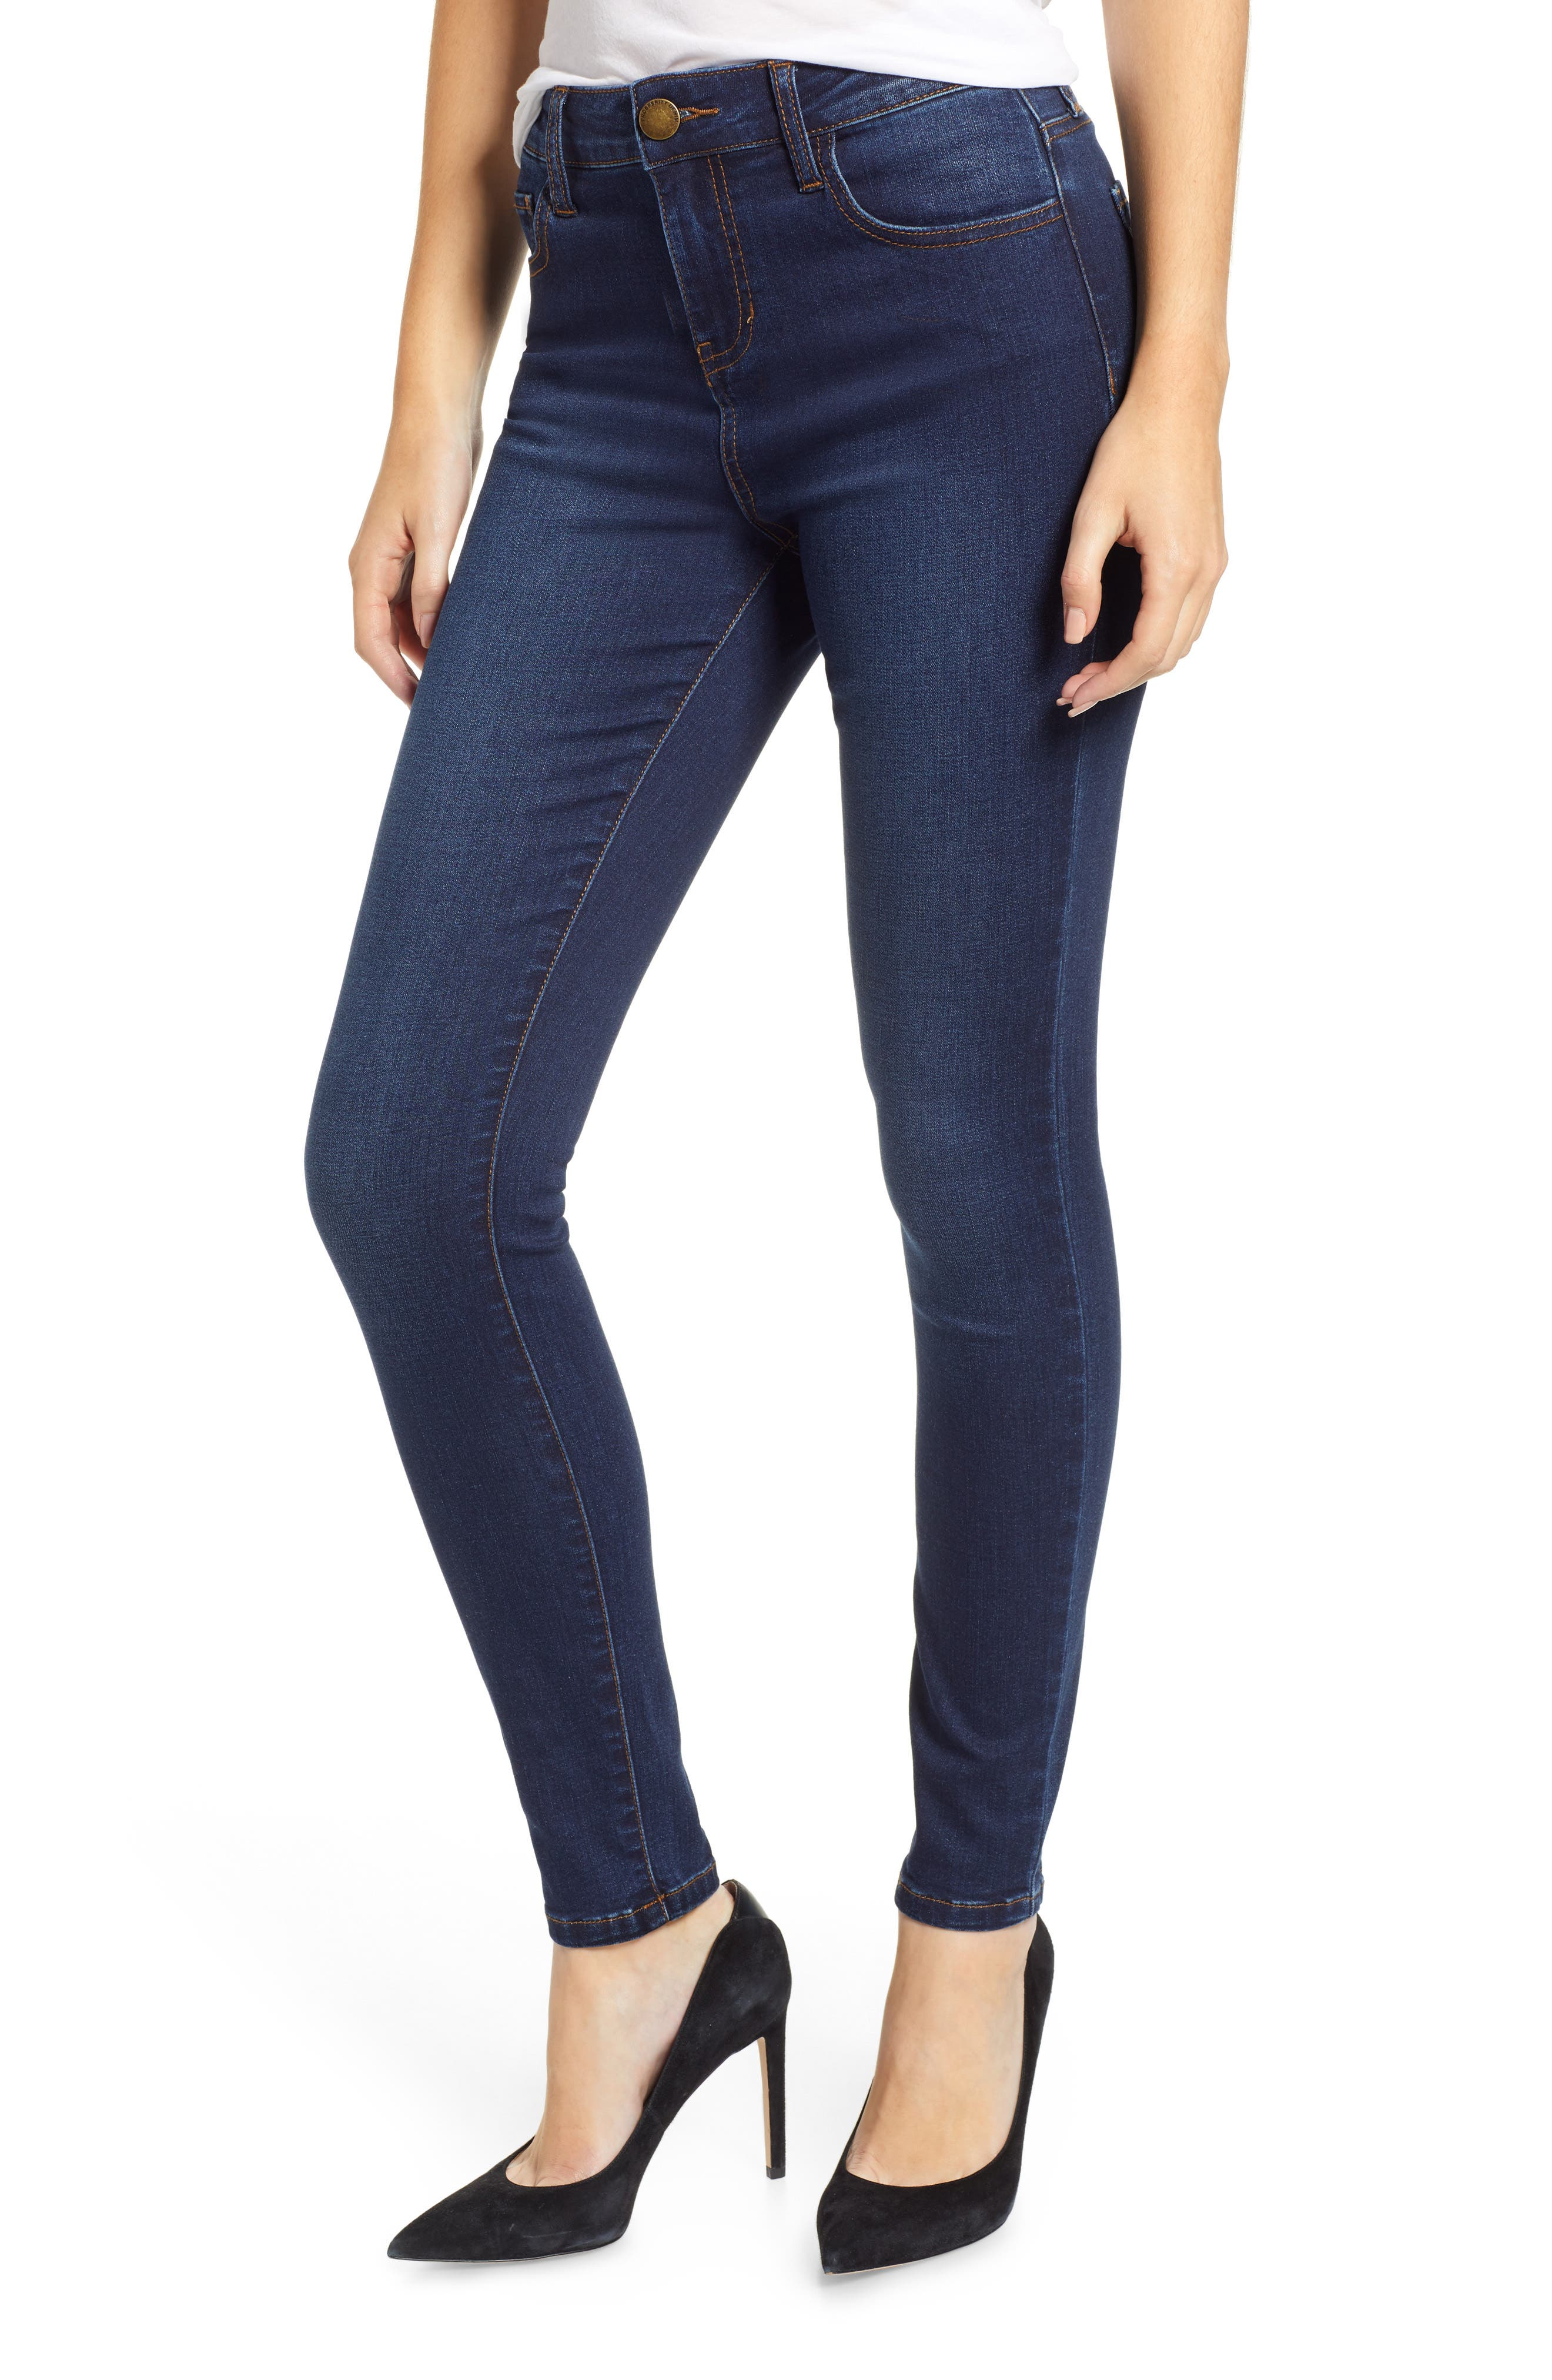 Women's Prosperity Denim High Waist Skinny Jeans